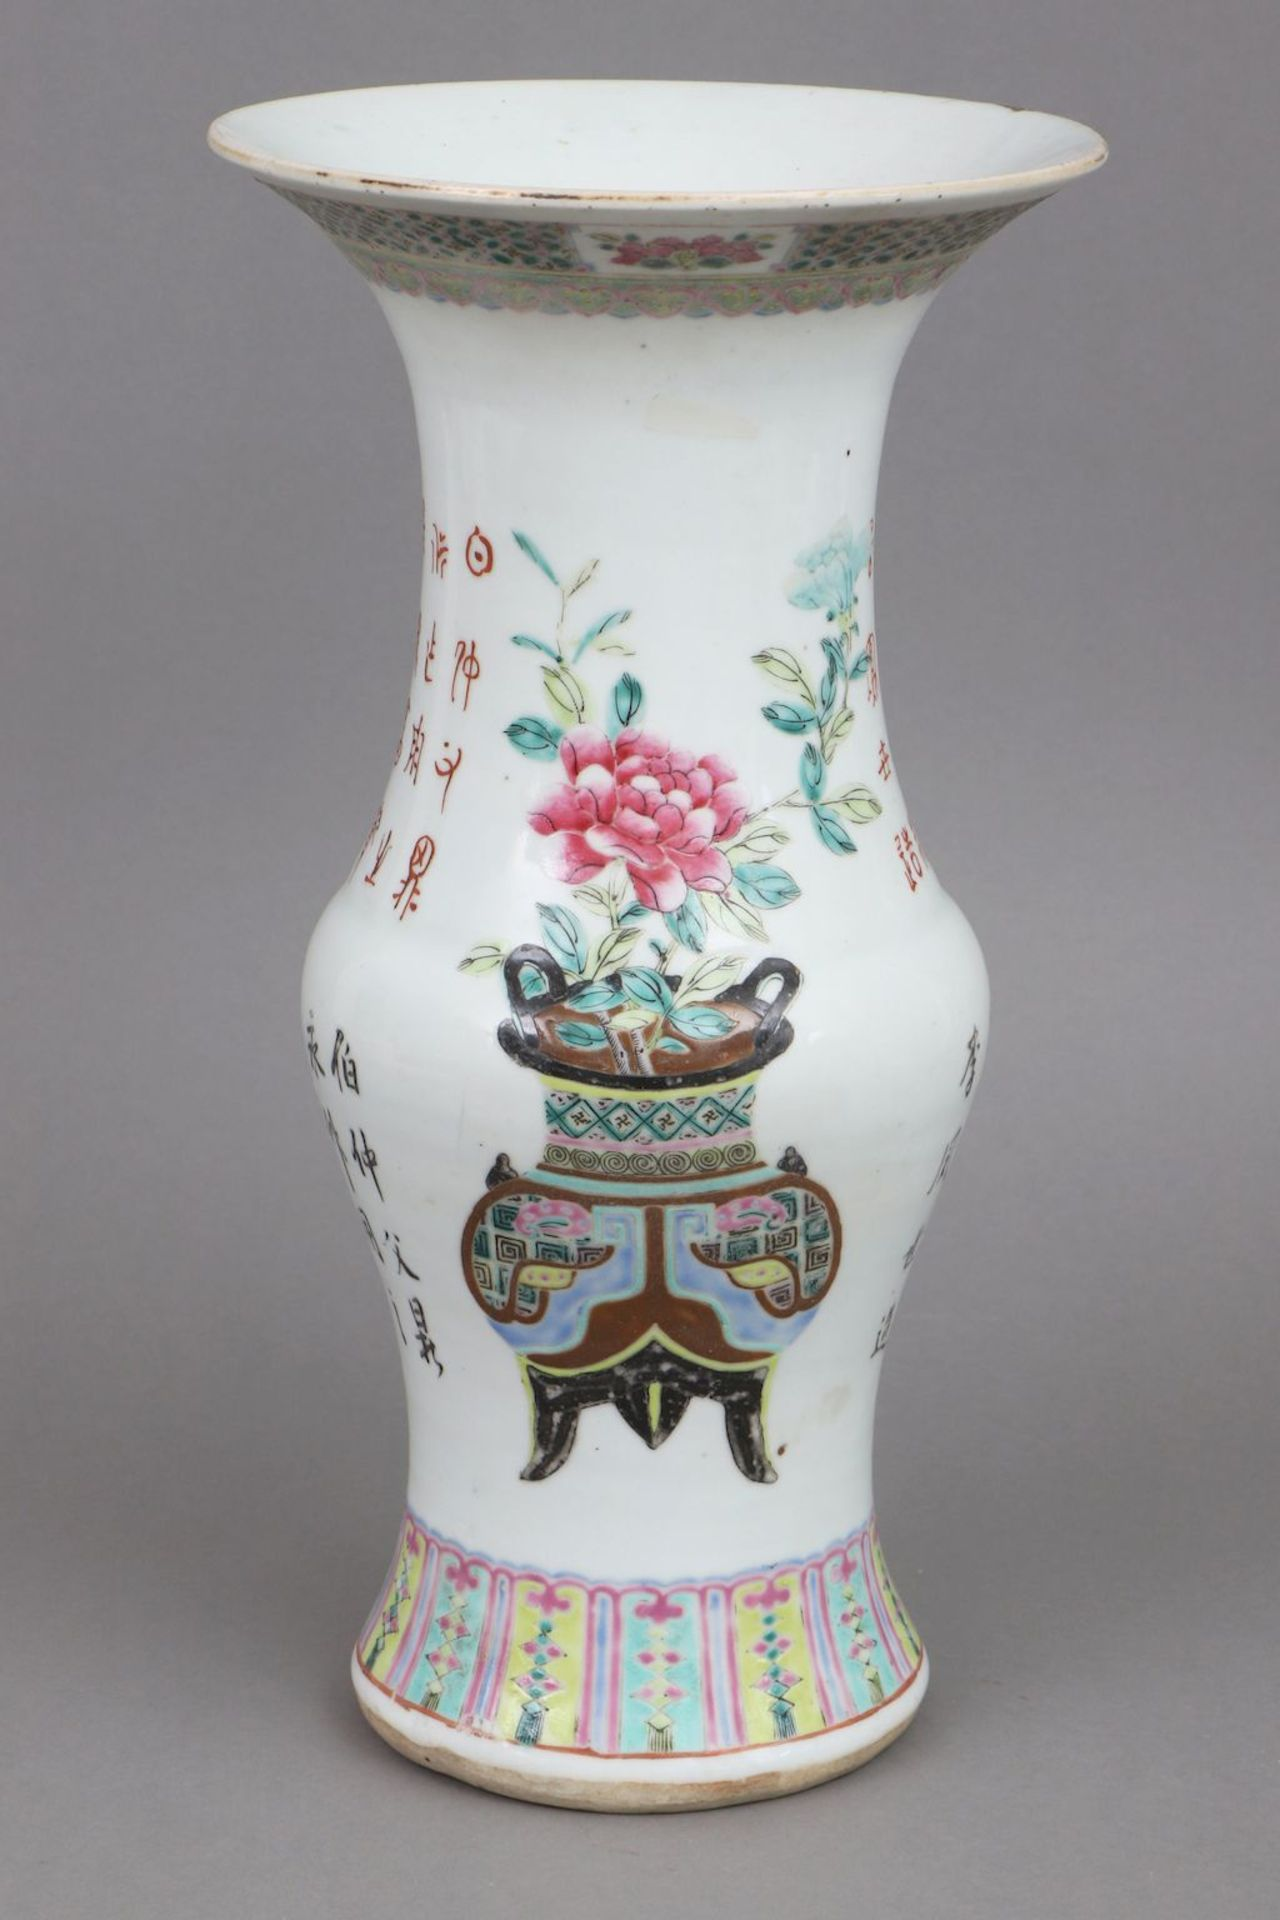 Chinesisches famille rose Vasengefäß in Zun-Form - Image 3 of 4